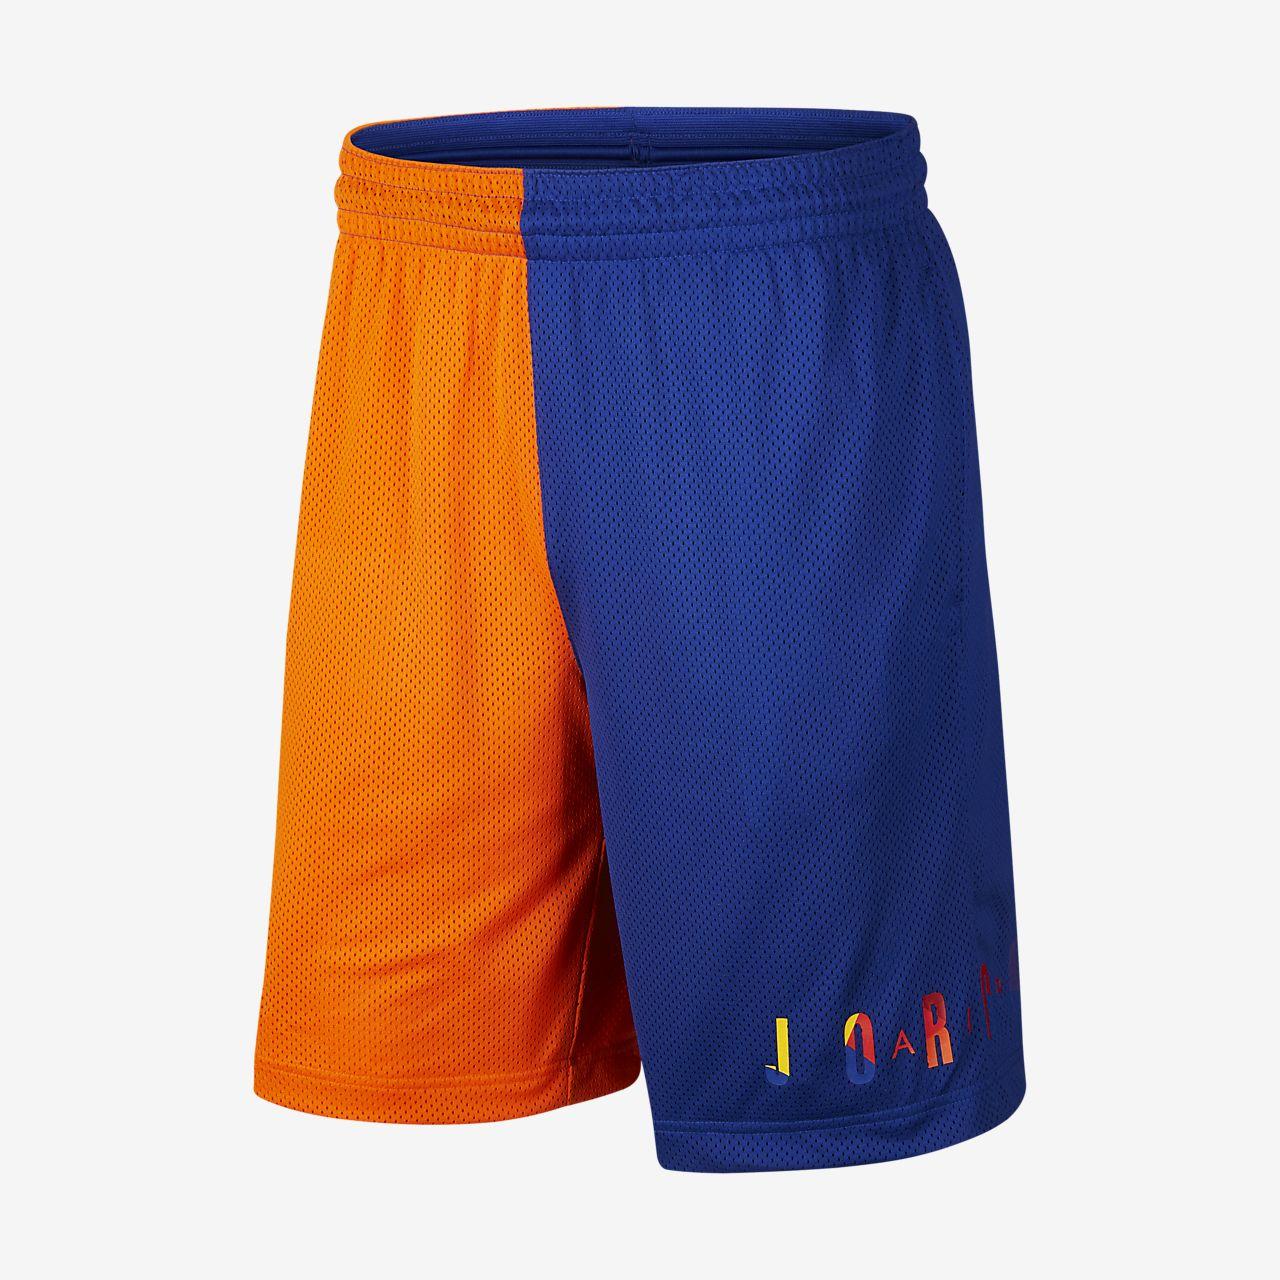 Jordan DNA Men's Basketball Shorts